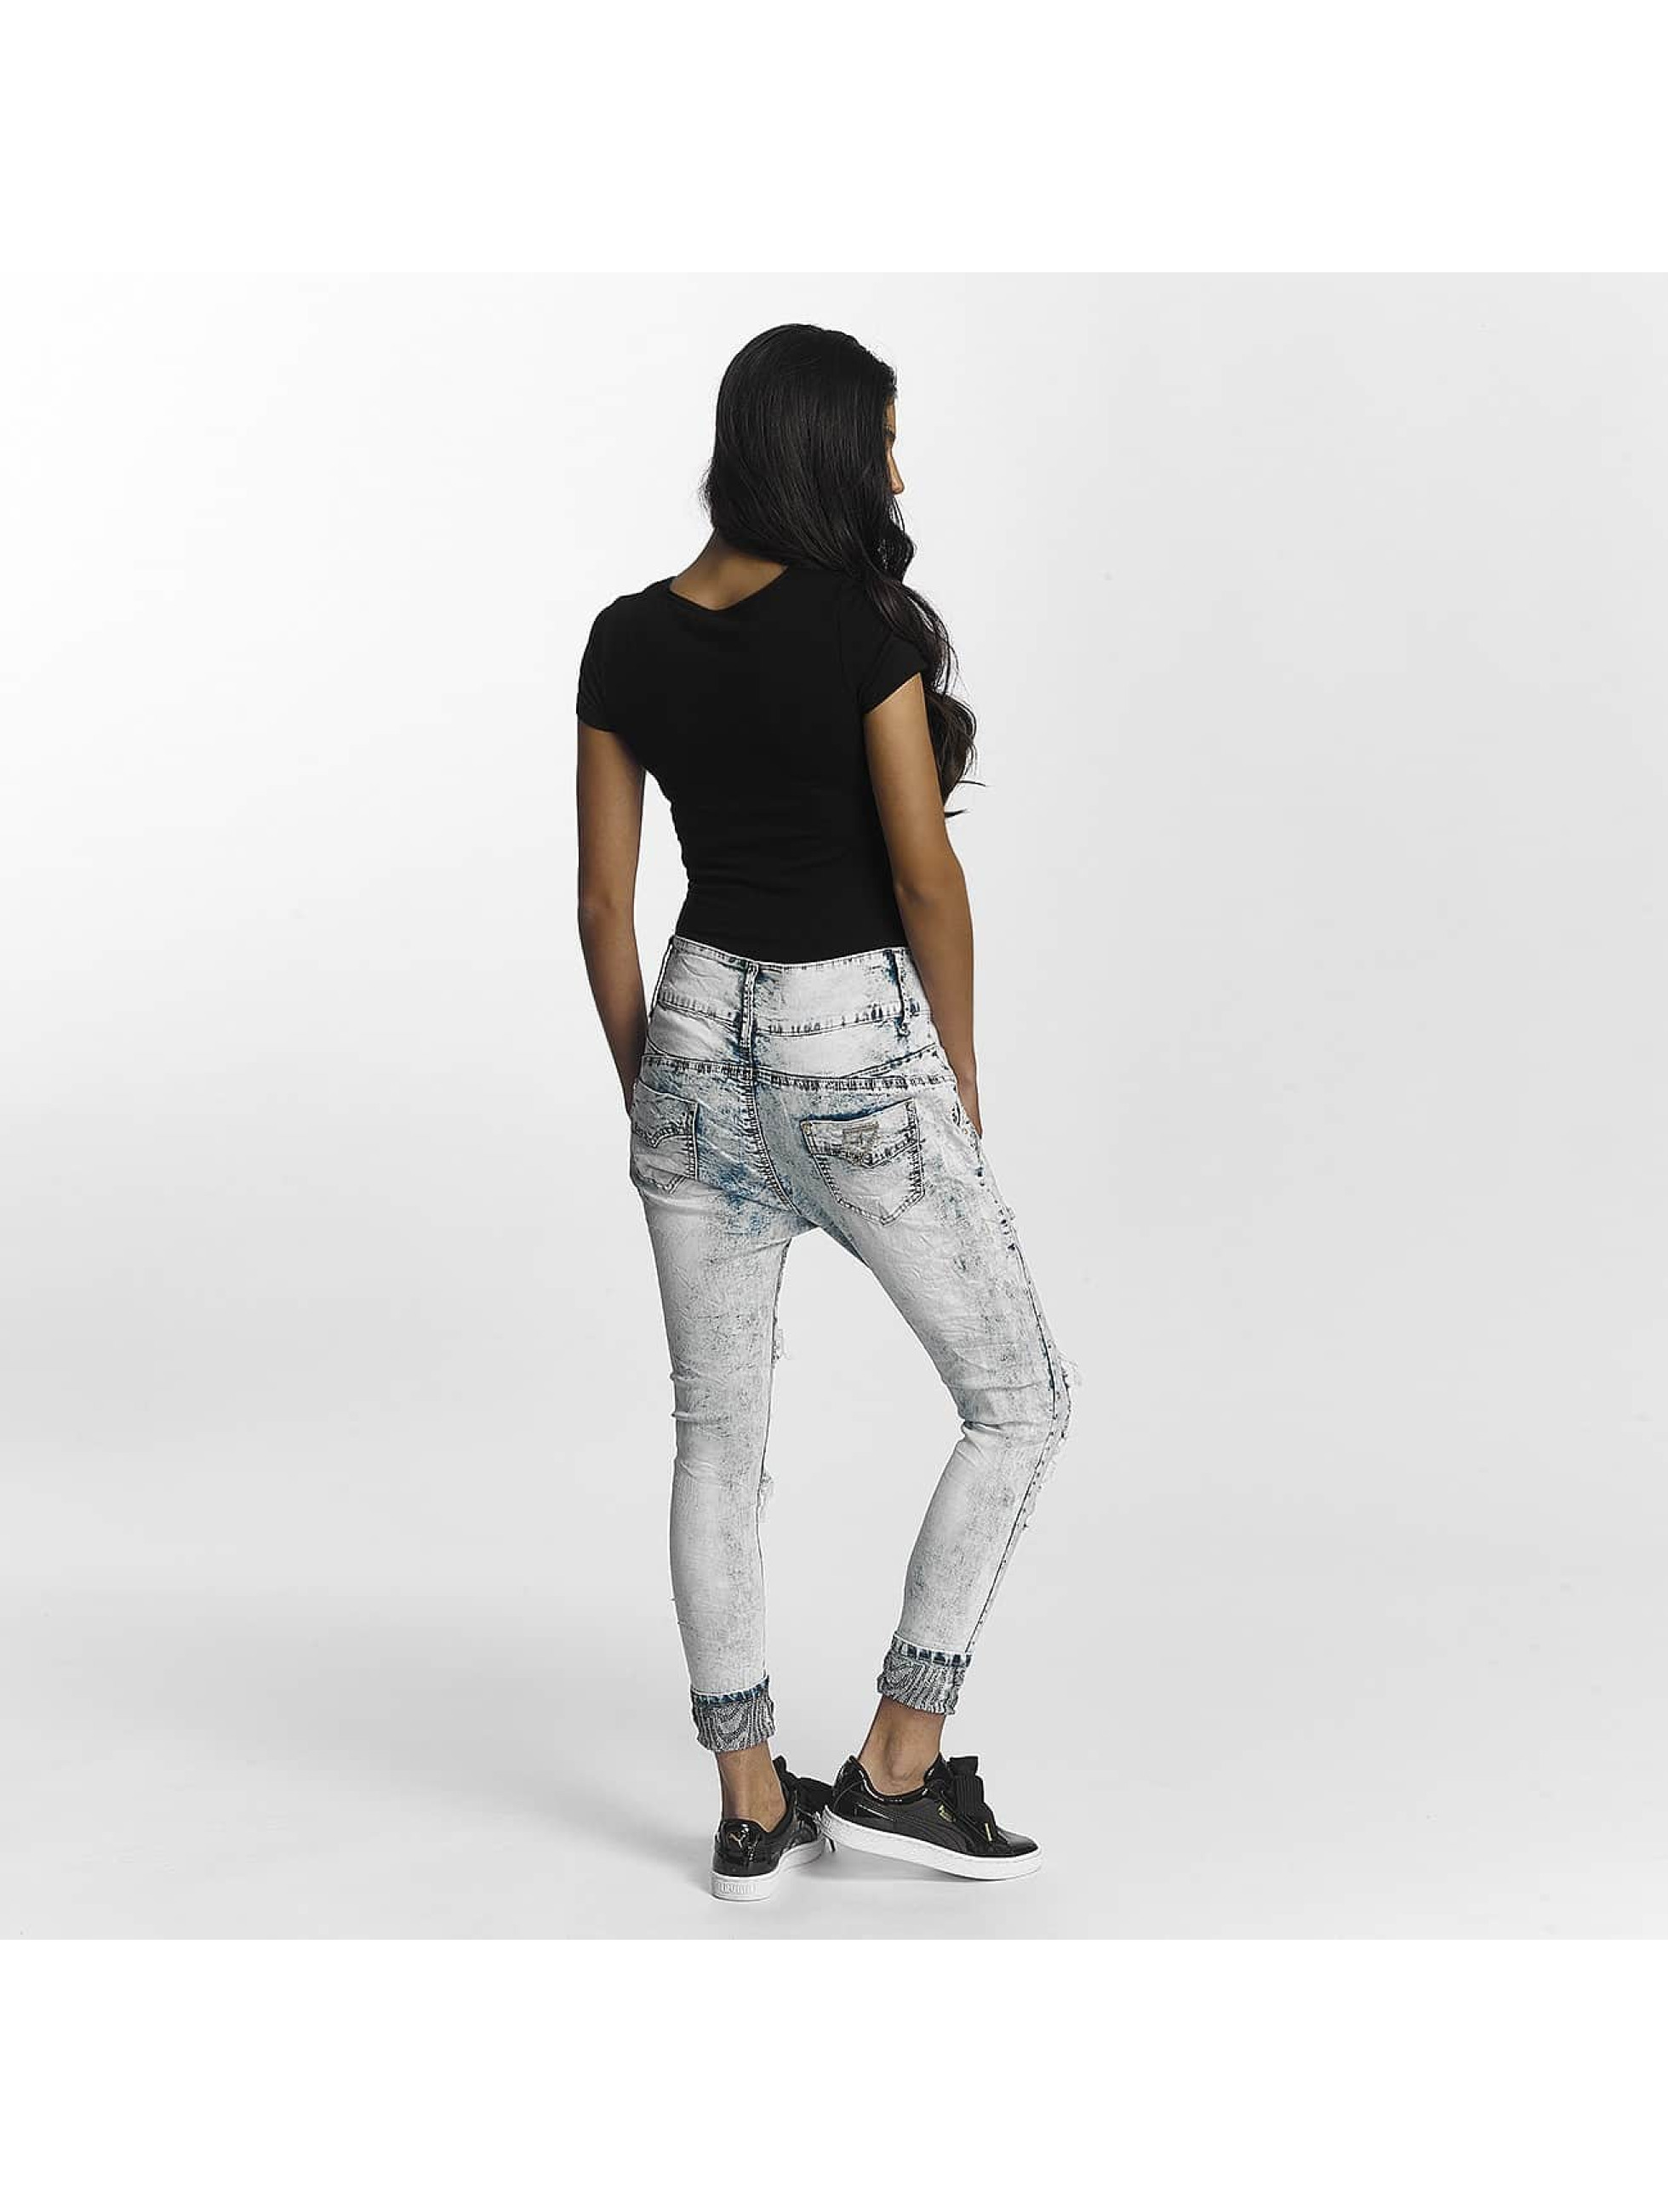 Leg Kings Boyfriend Jeans Original Denim blue